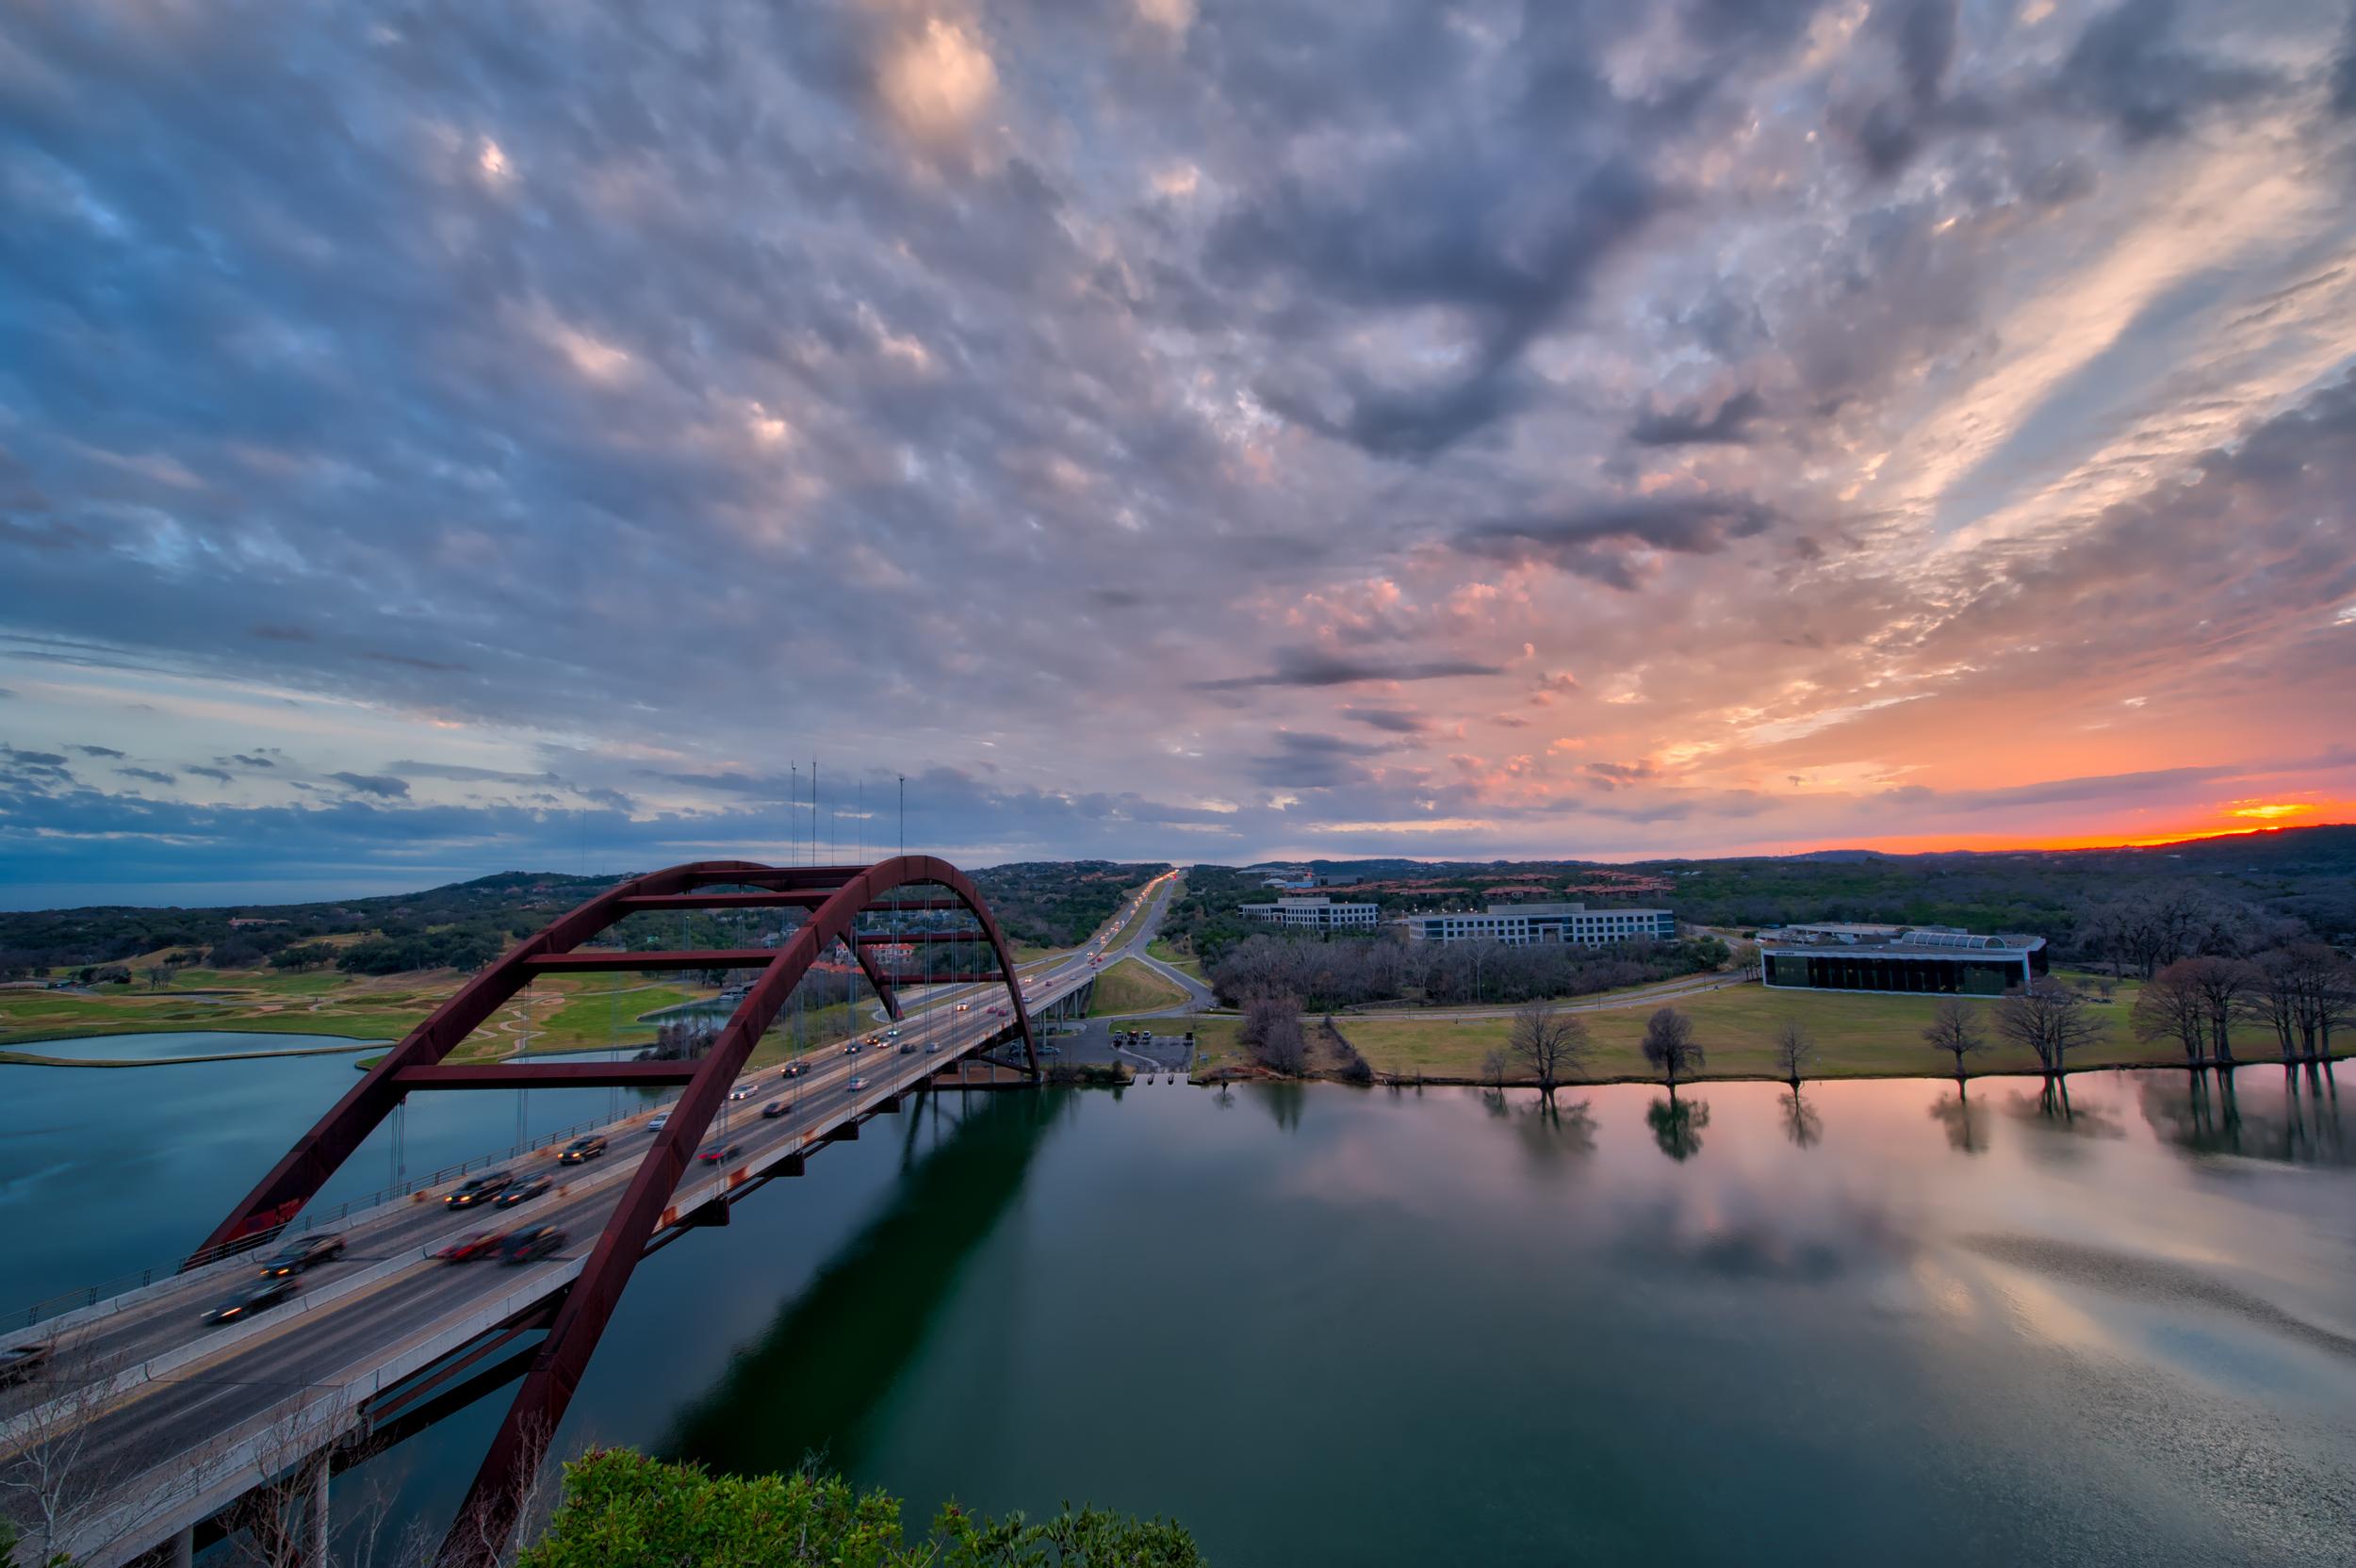 Sunset over the Loop 360 Bridge in Austin, TX